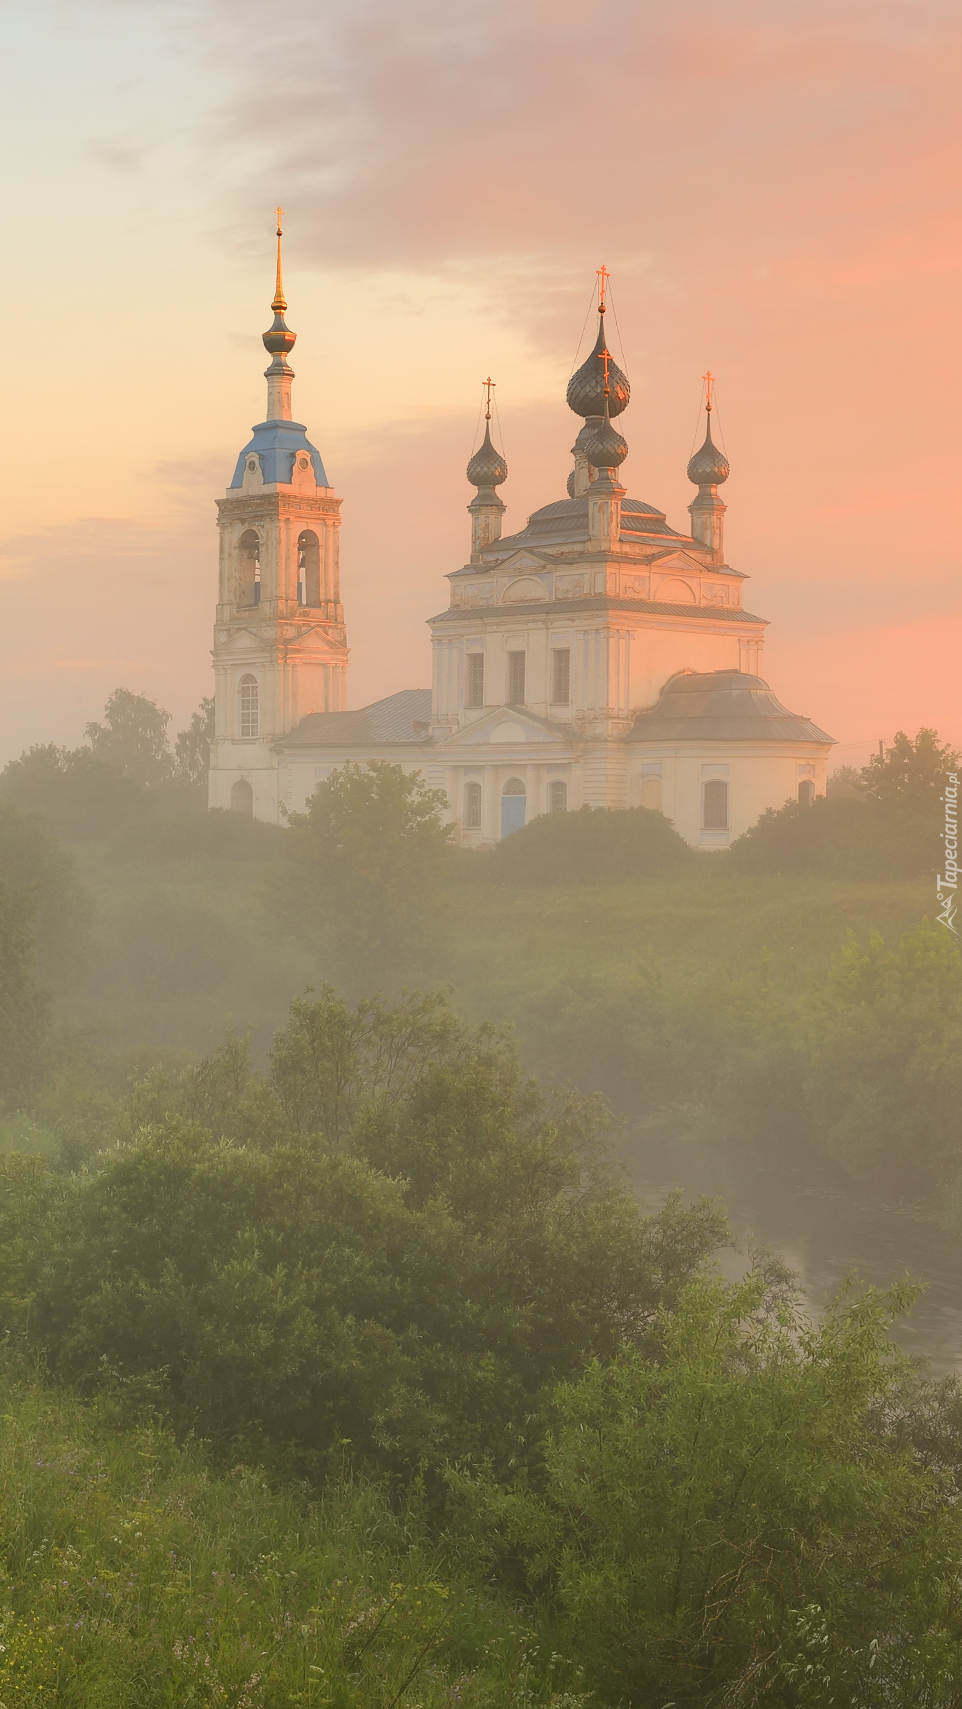 Cerkiew we mgle